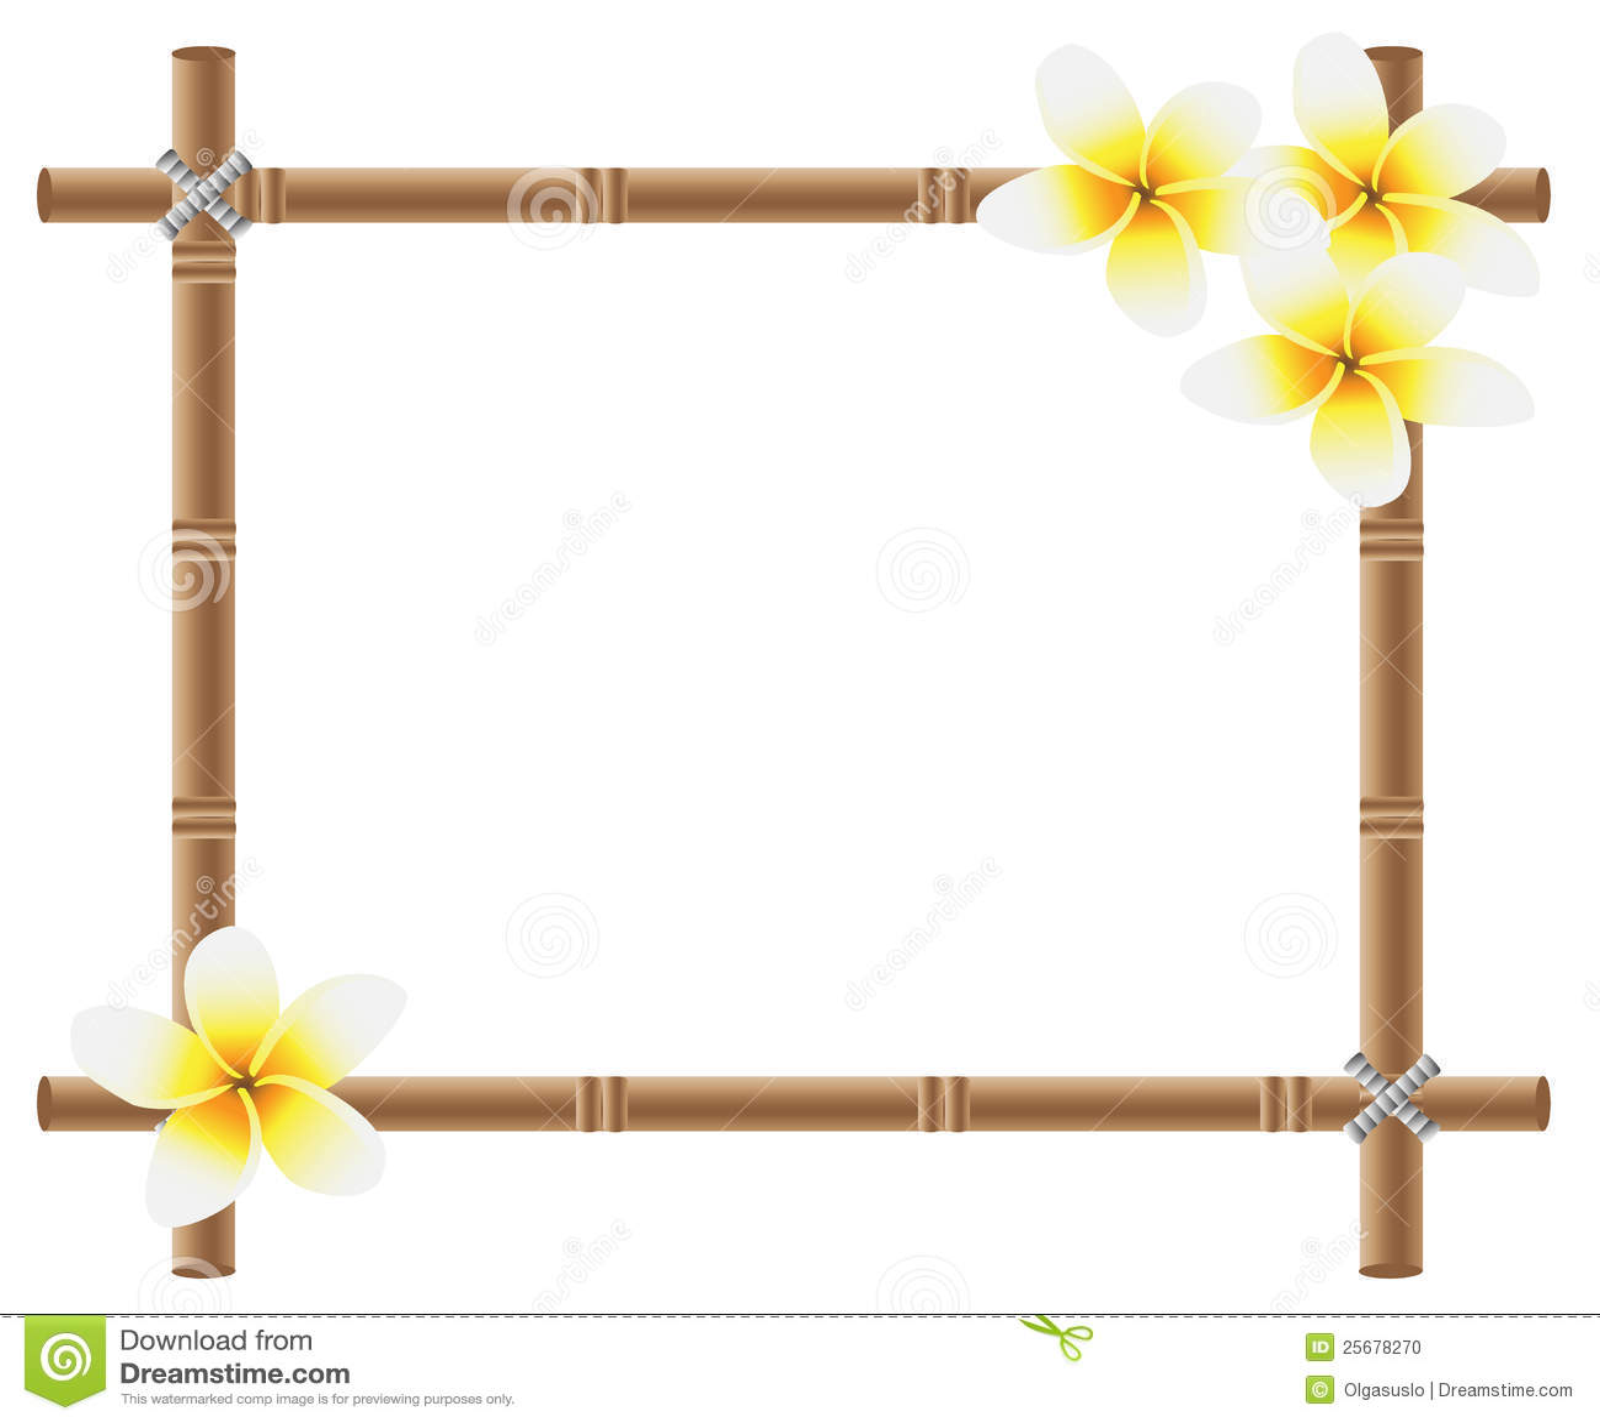 Bamboo Tiki Border Clip Art bamboo frame stock photo - image: 25678270